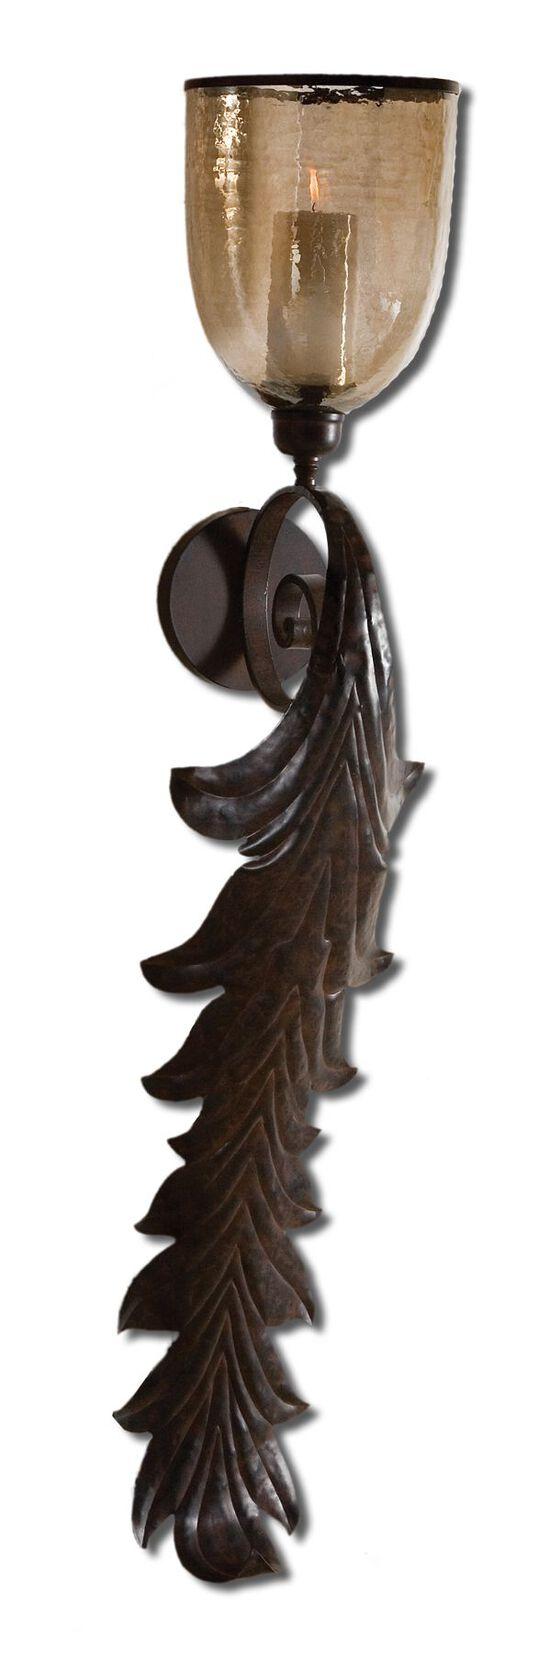 Flowing Leaf Wall Sconce in Dark Rust Bronze